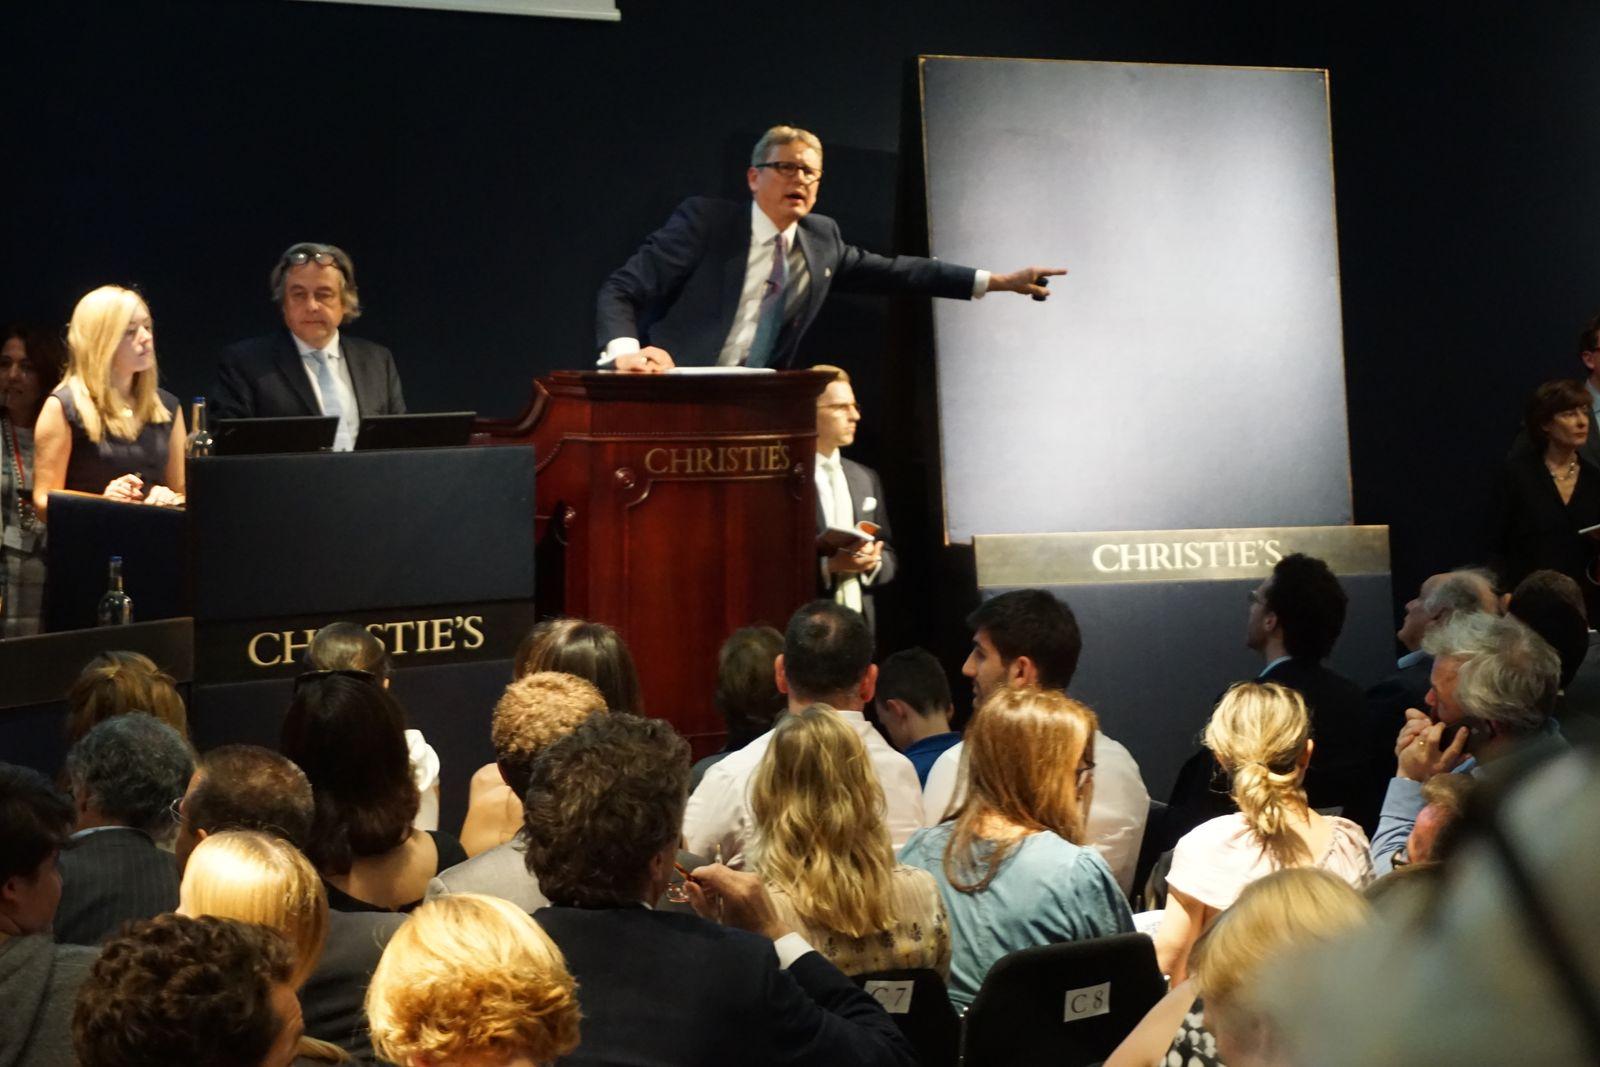 Christies / Auktion